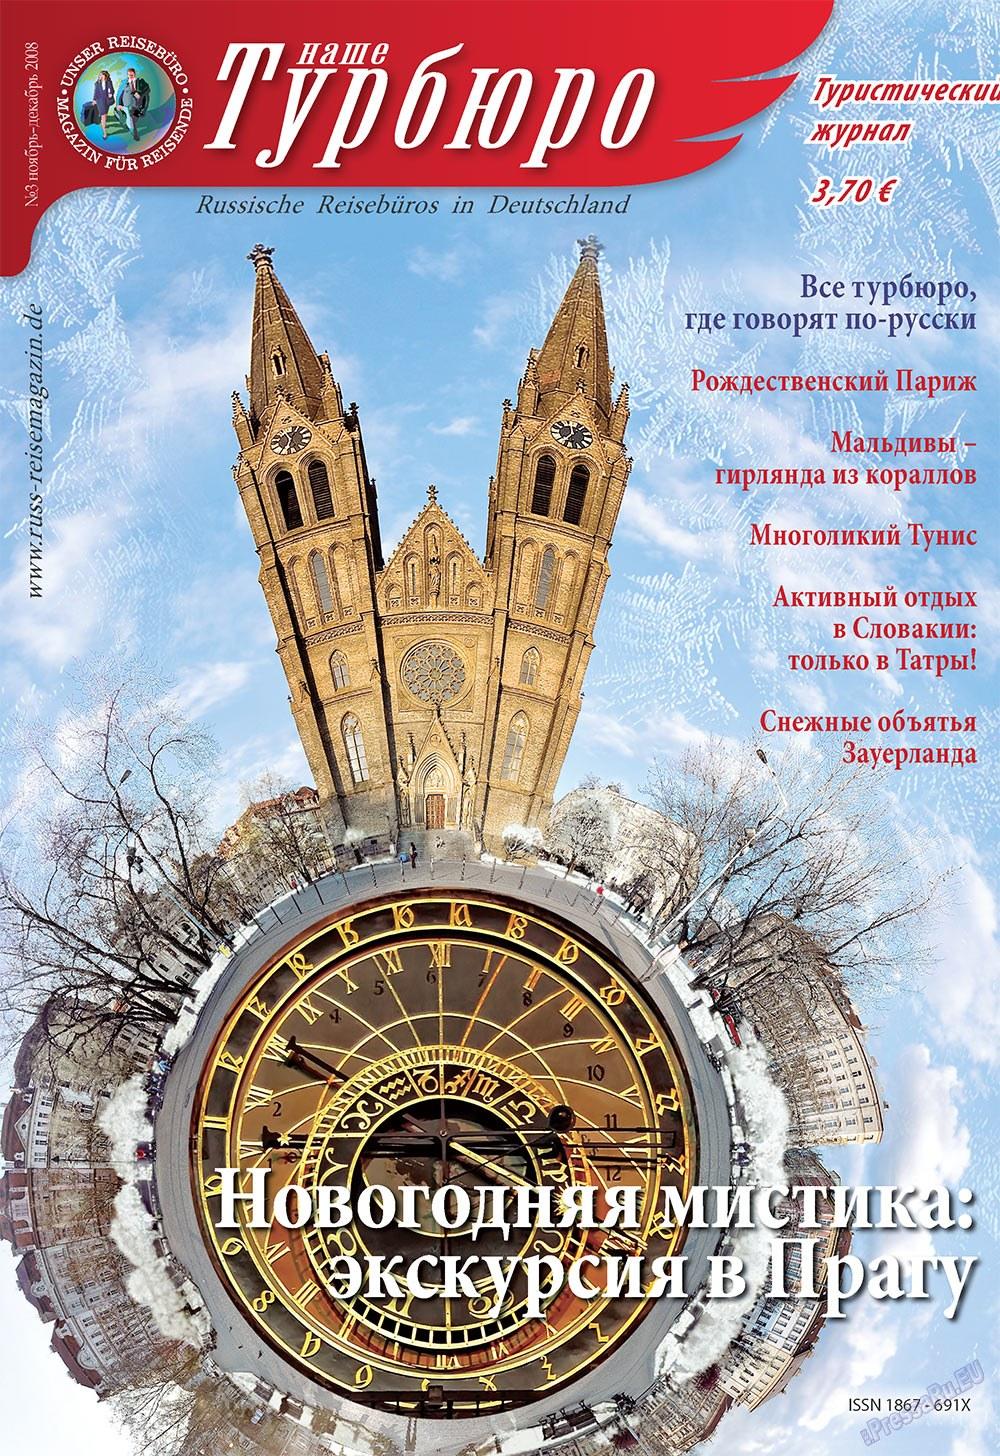 Наше Турбюро (журнал). 2008 год, номер 3, стр. 1